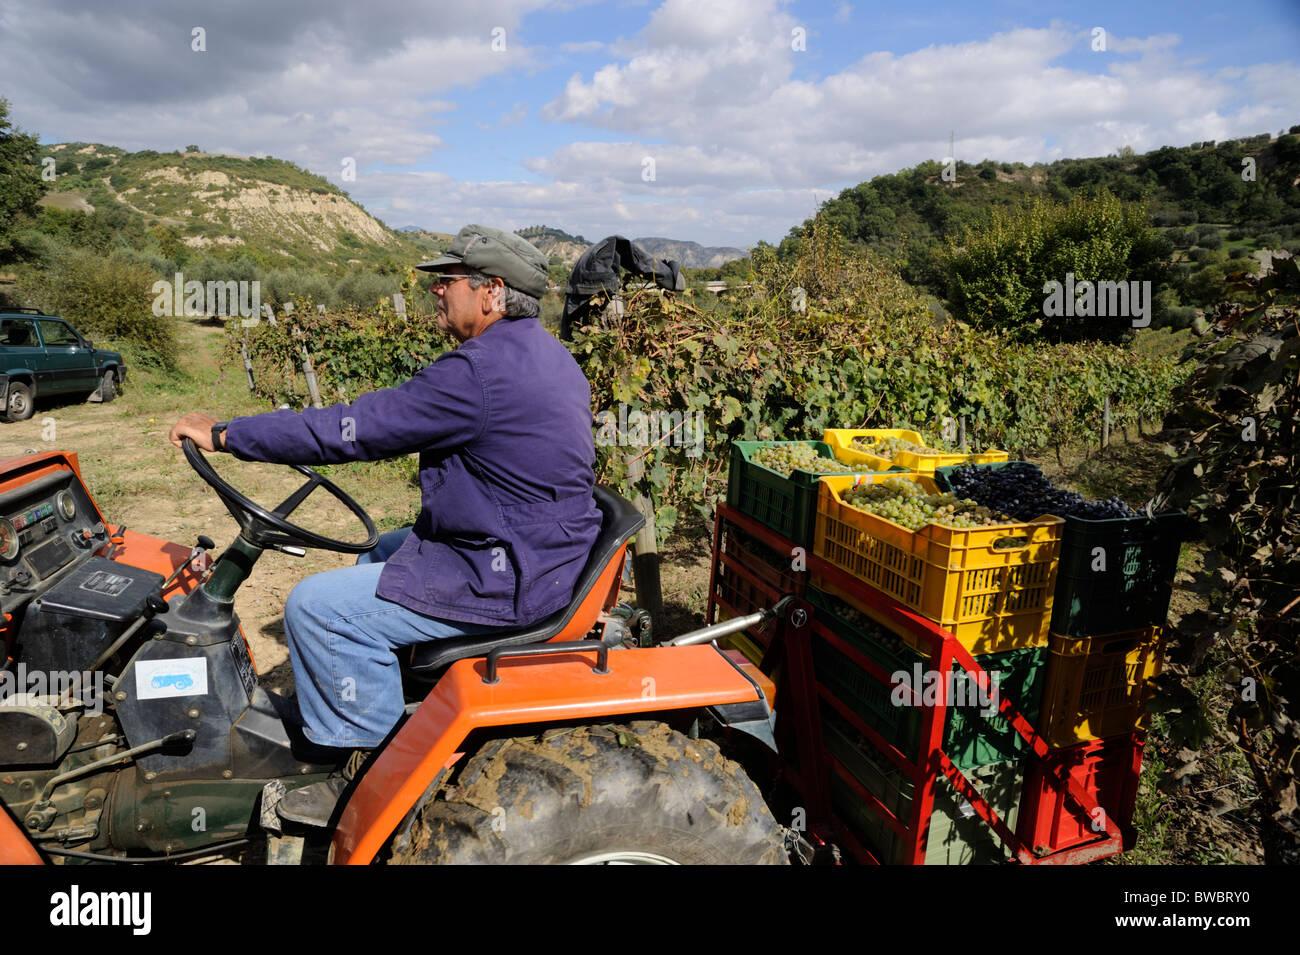 italy, basilicata, vineyards, grape harvest, tractor - Stock Image